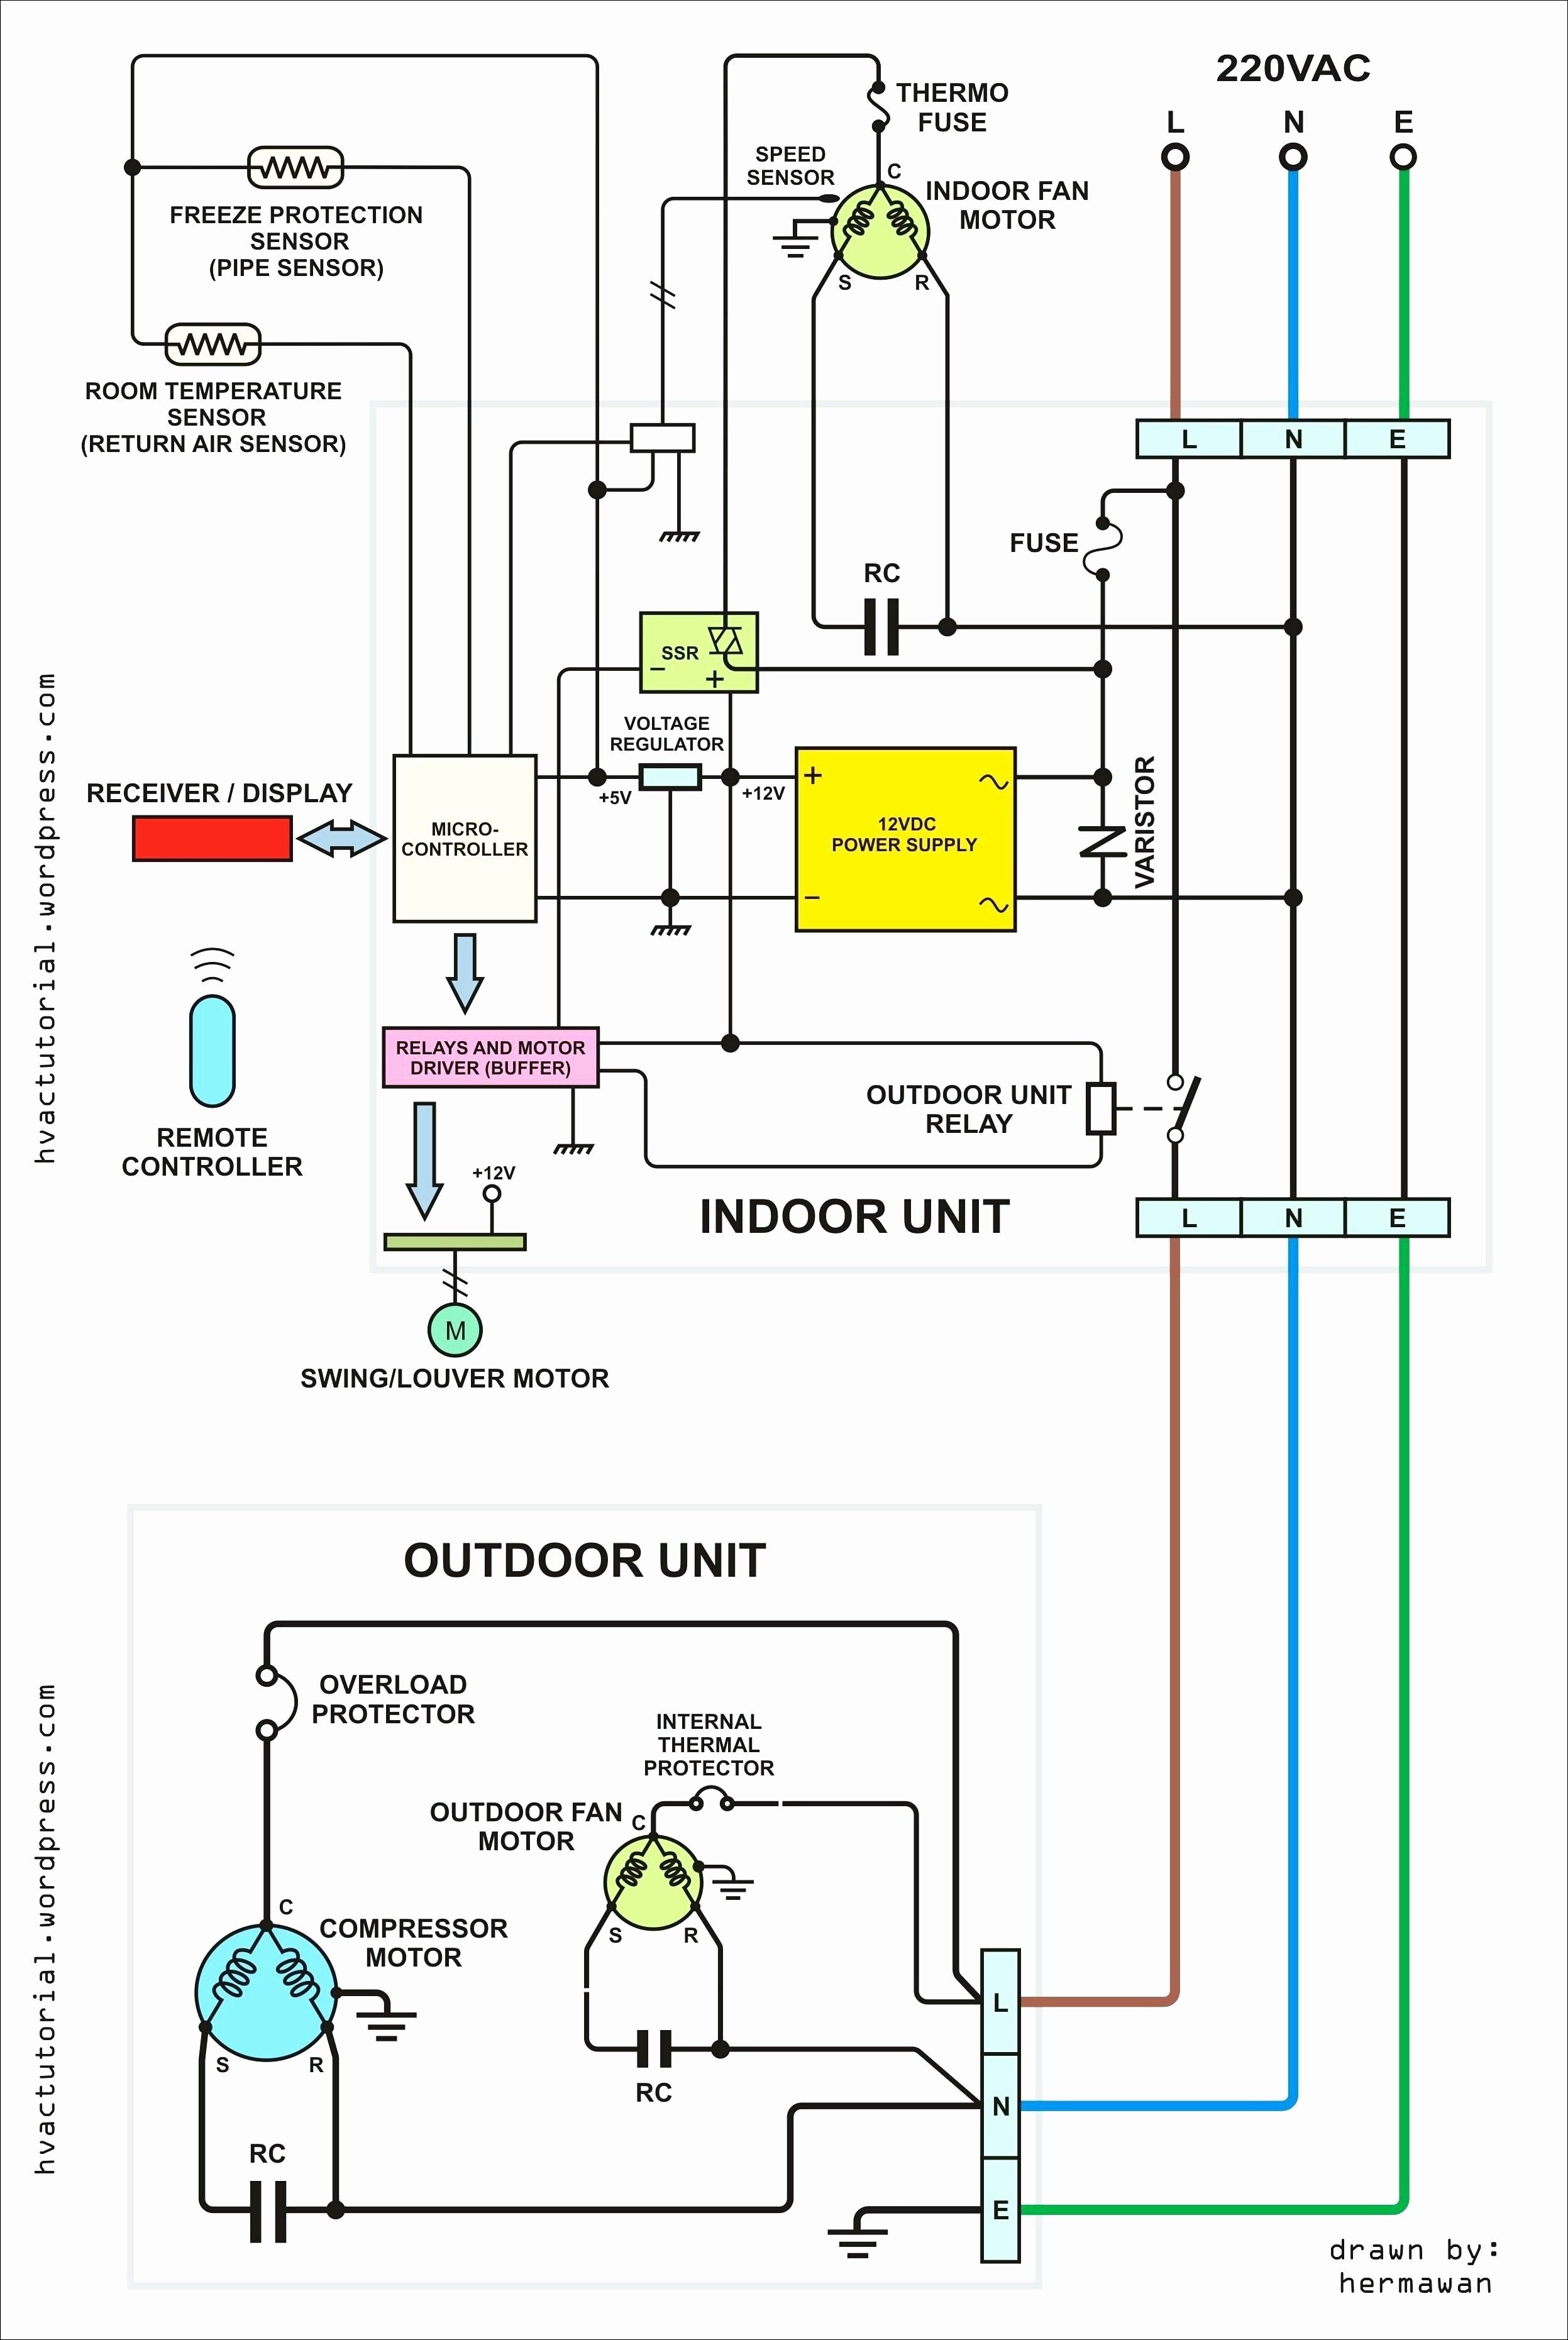 Pioneer Deh X6700bt Wiring Diagram In 2020 Electrical Wiring Diagram Electrical Circuit Diagram Ac Wiring